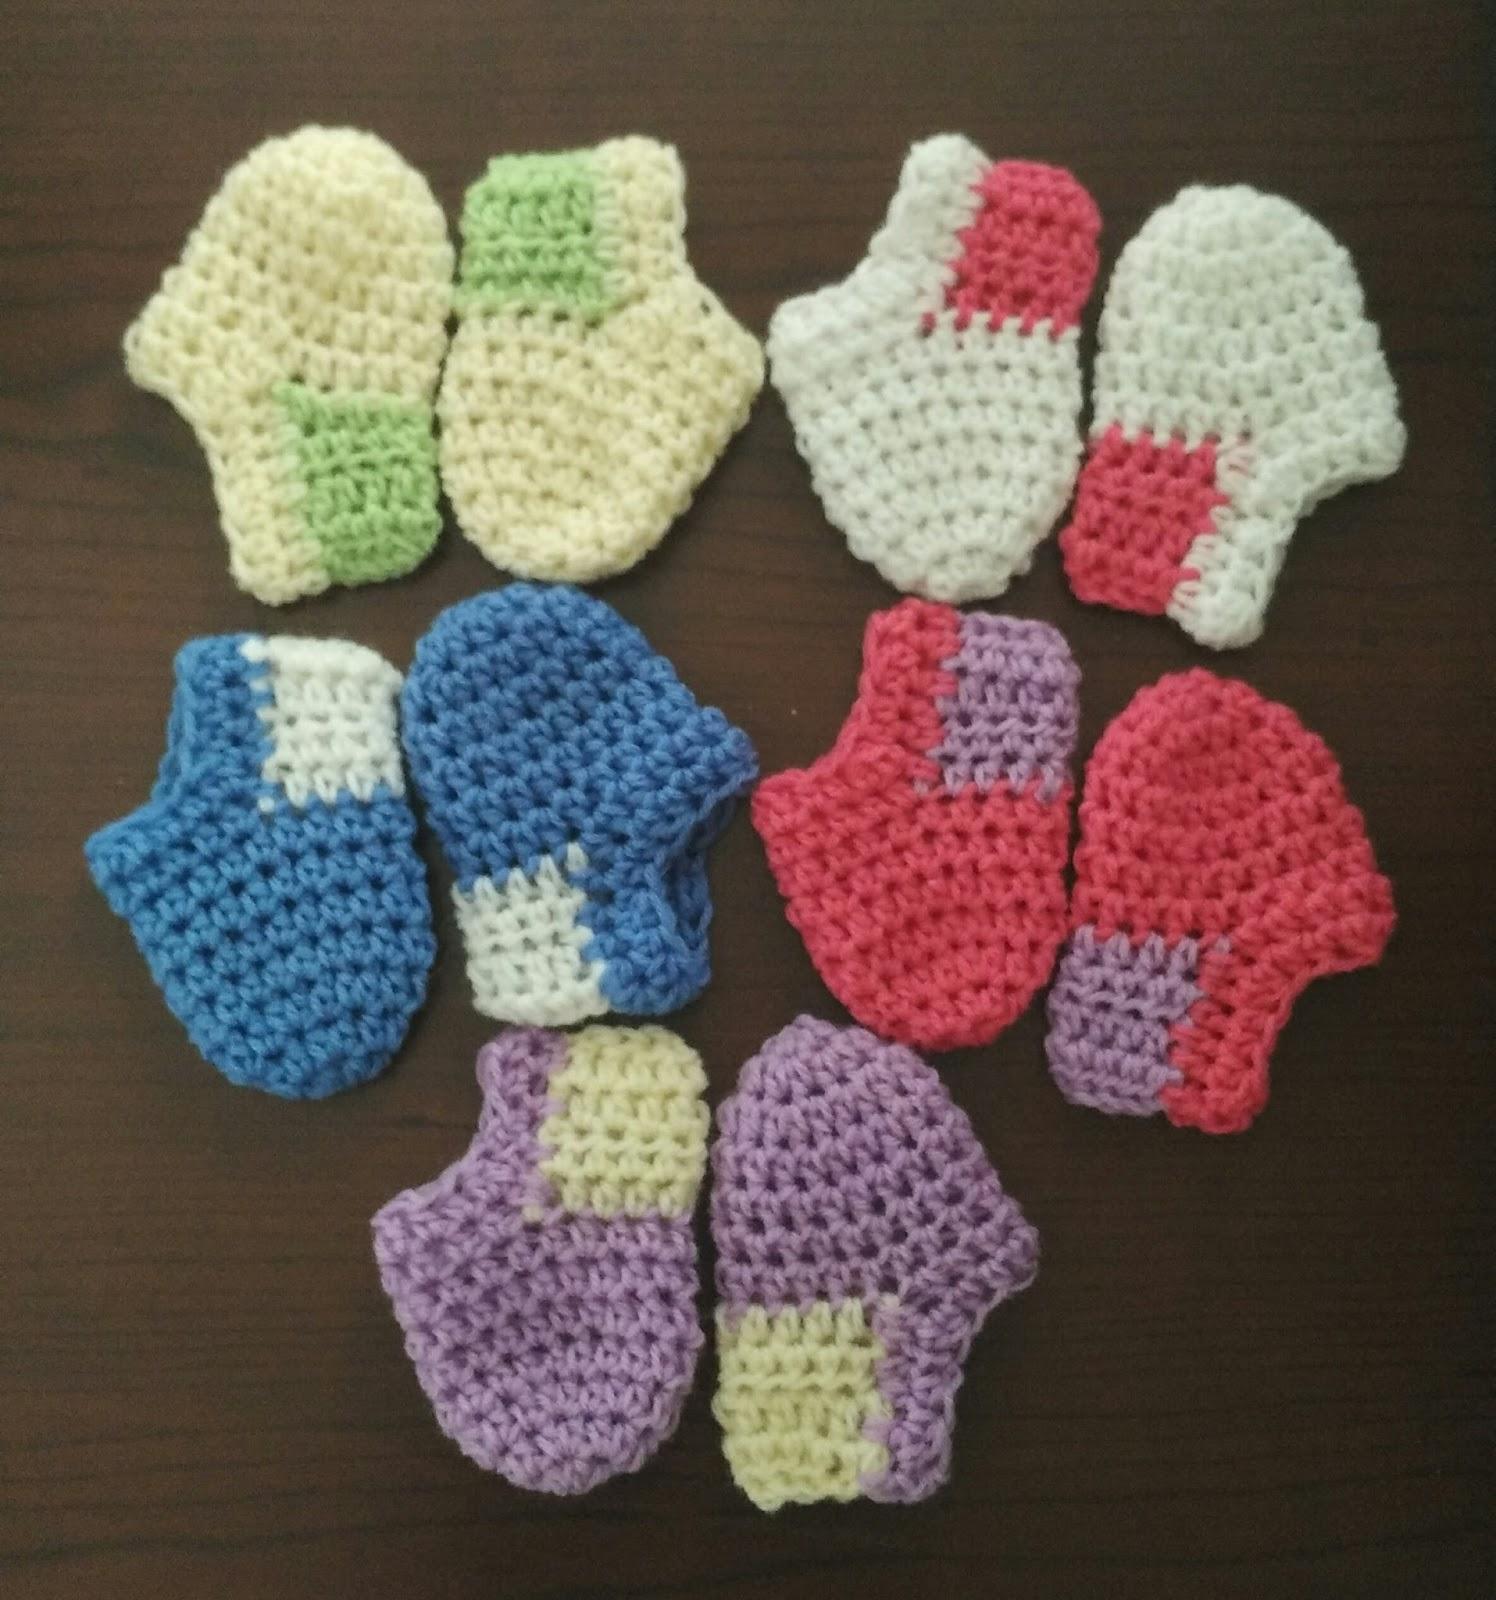 crochet kalaakari: Crochet socks/booties 0-3 months beginner ...